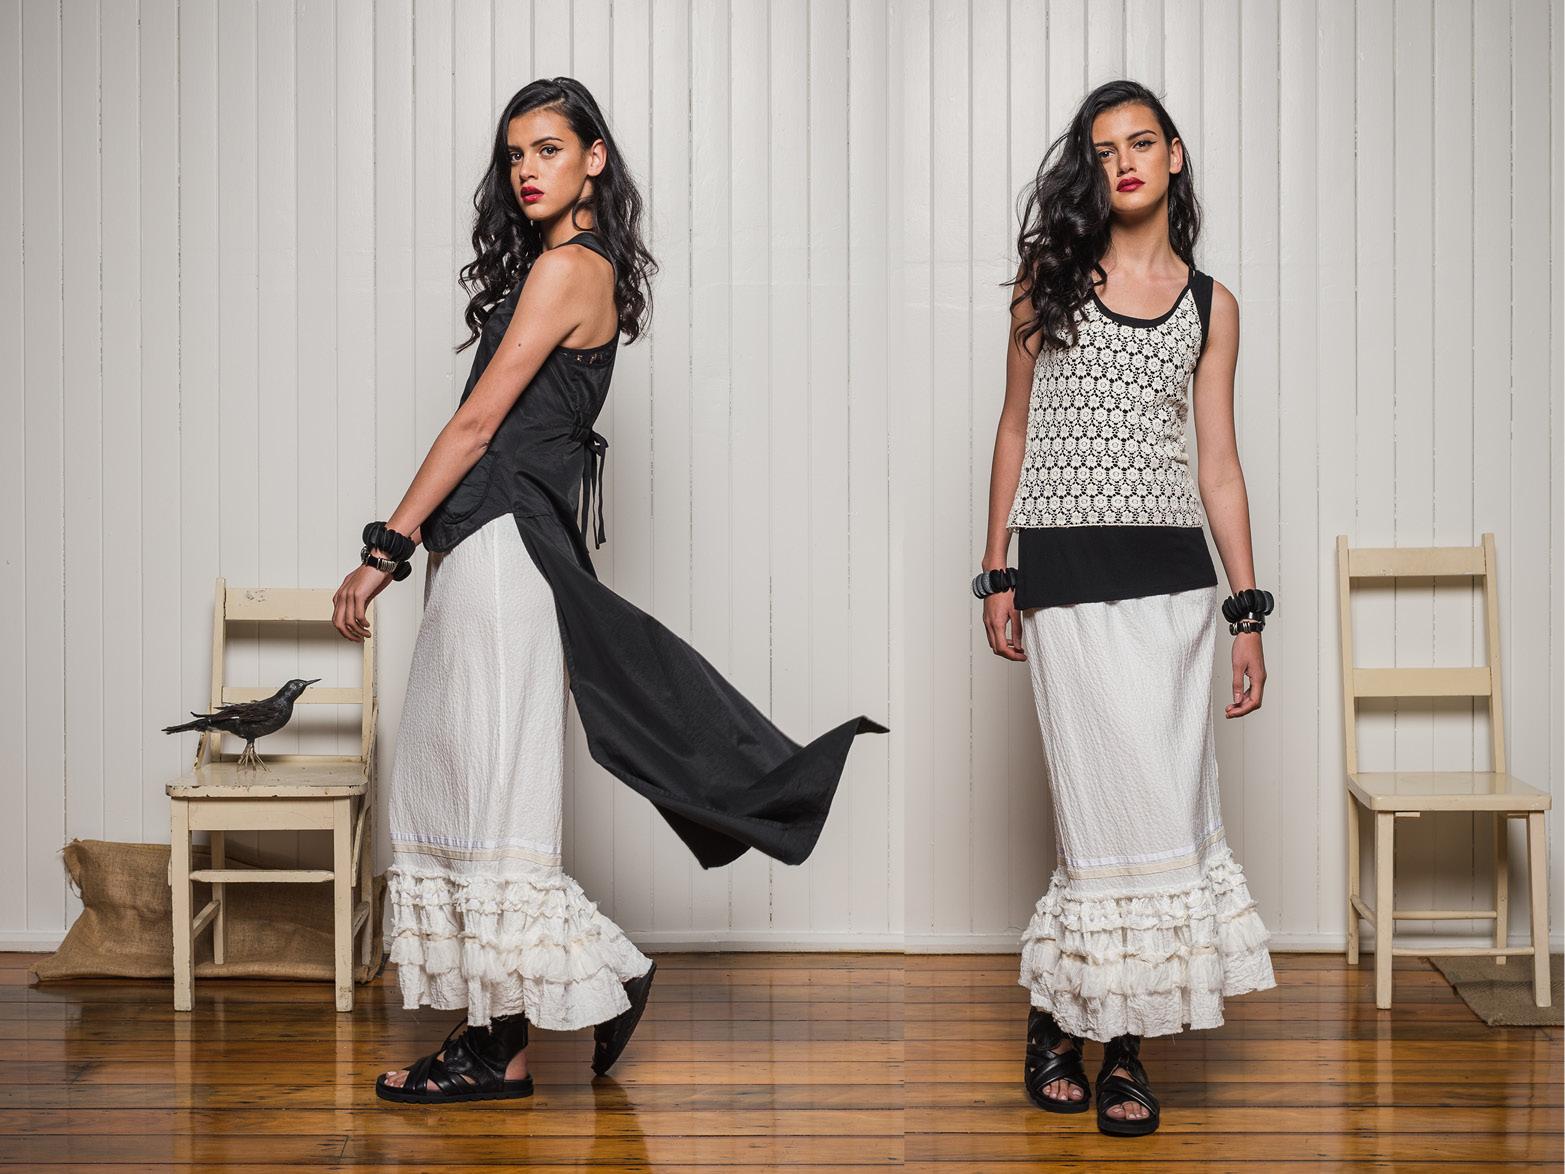 LEFT: Petal Lace top + Carrie tails + Banksii petticoat RIGHT: Greta singlet + Petal lace top + Banksii petticoat